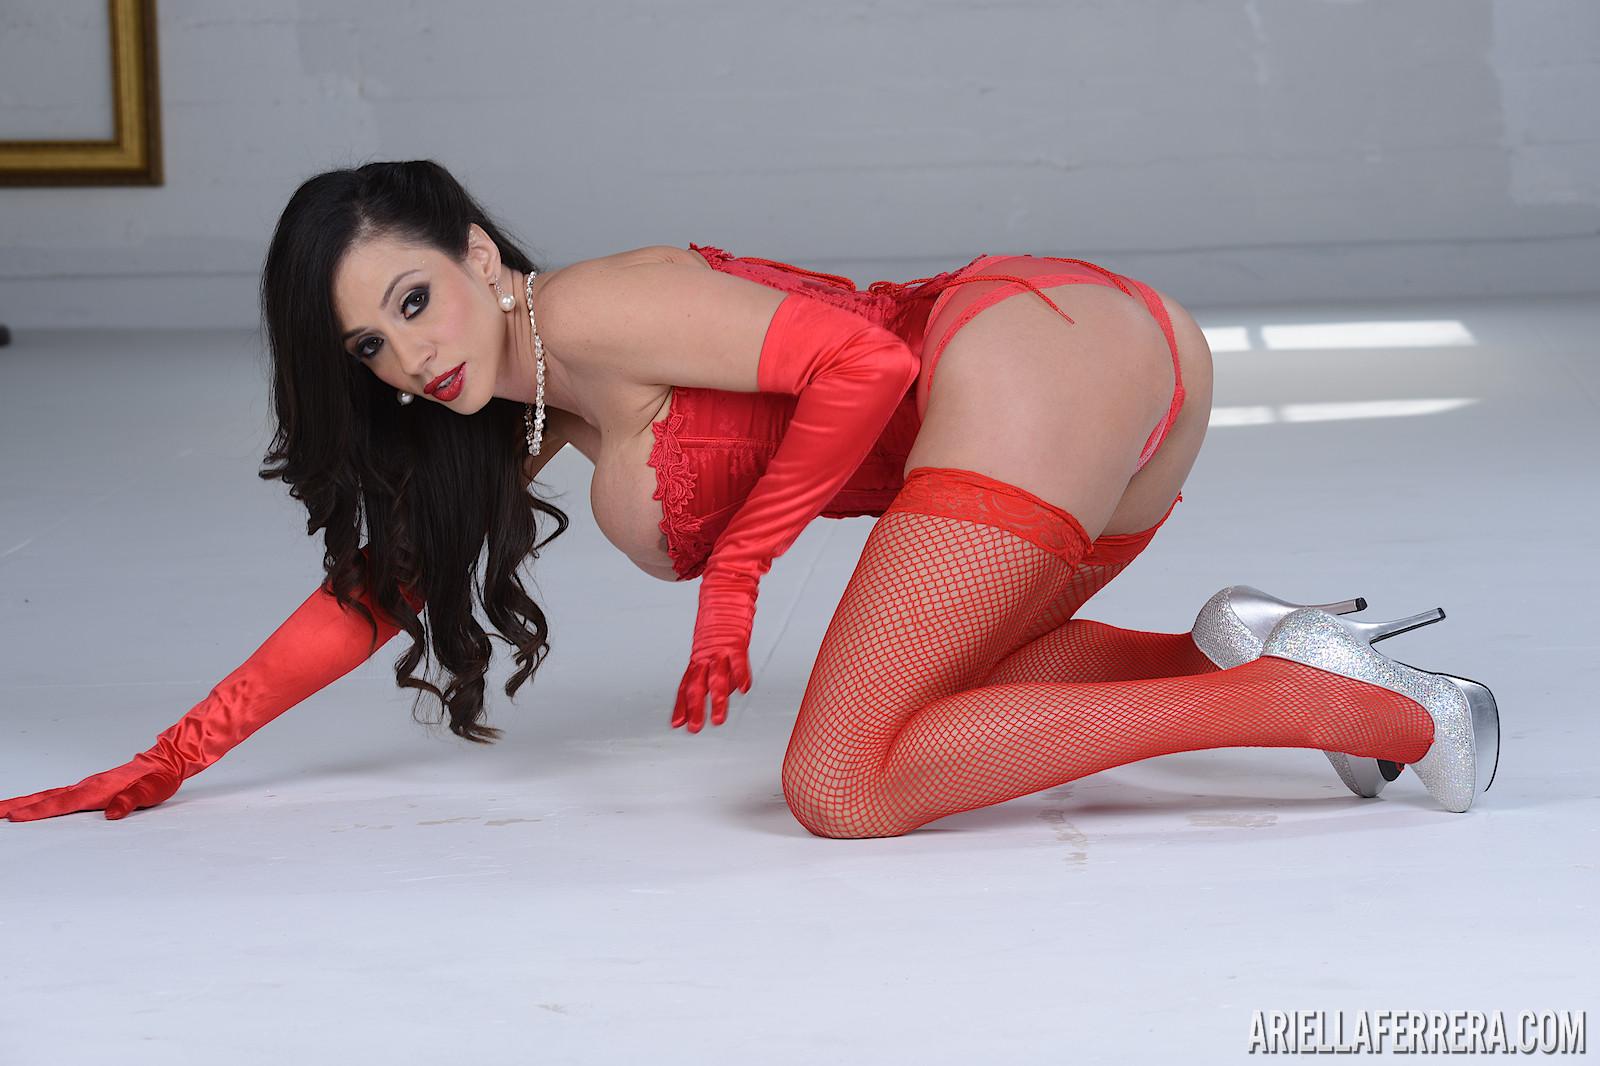 Ariella Ferrera - Галерея 3469747